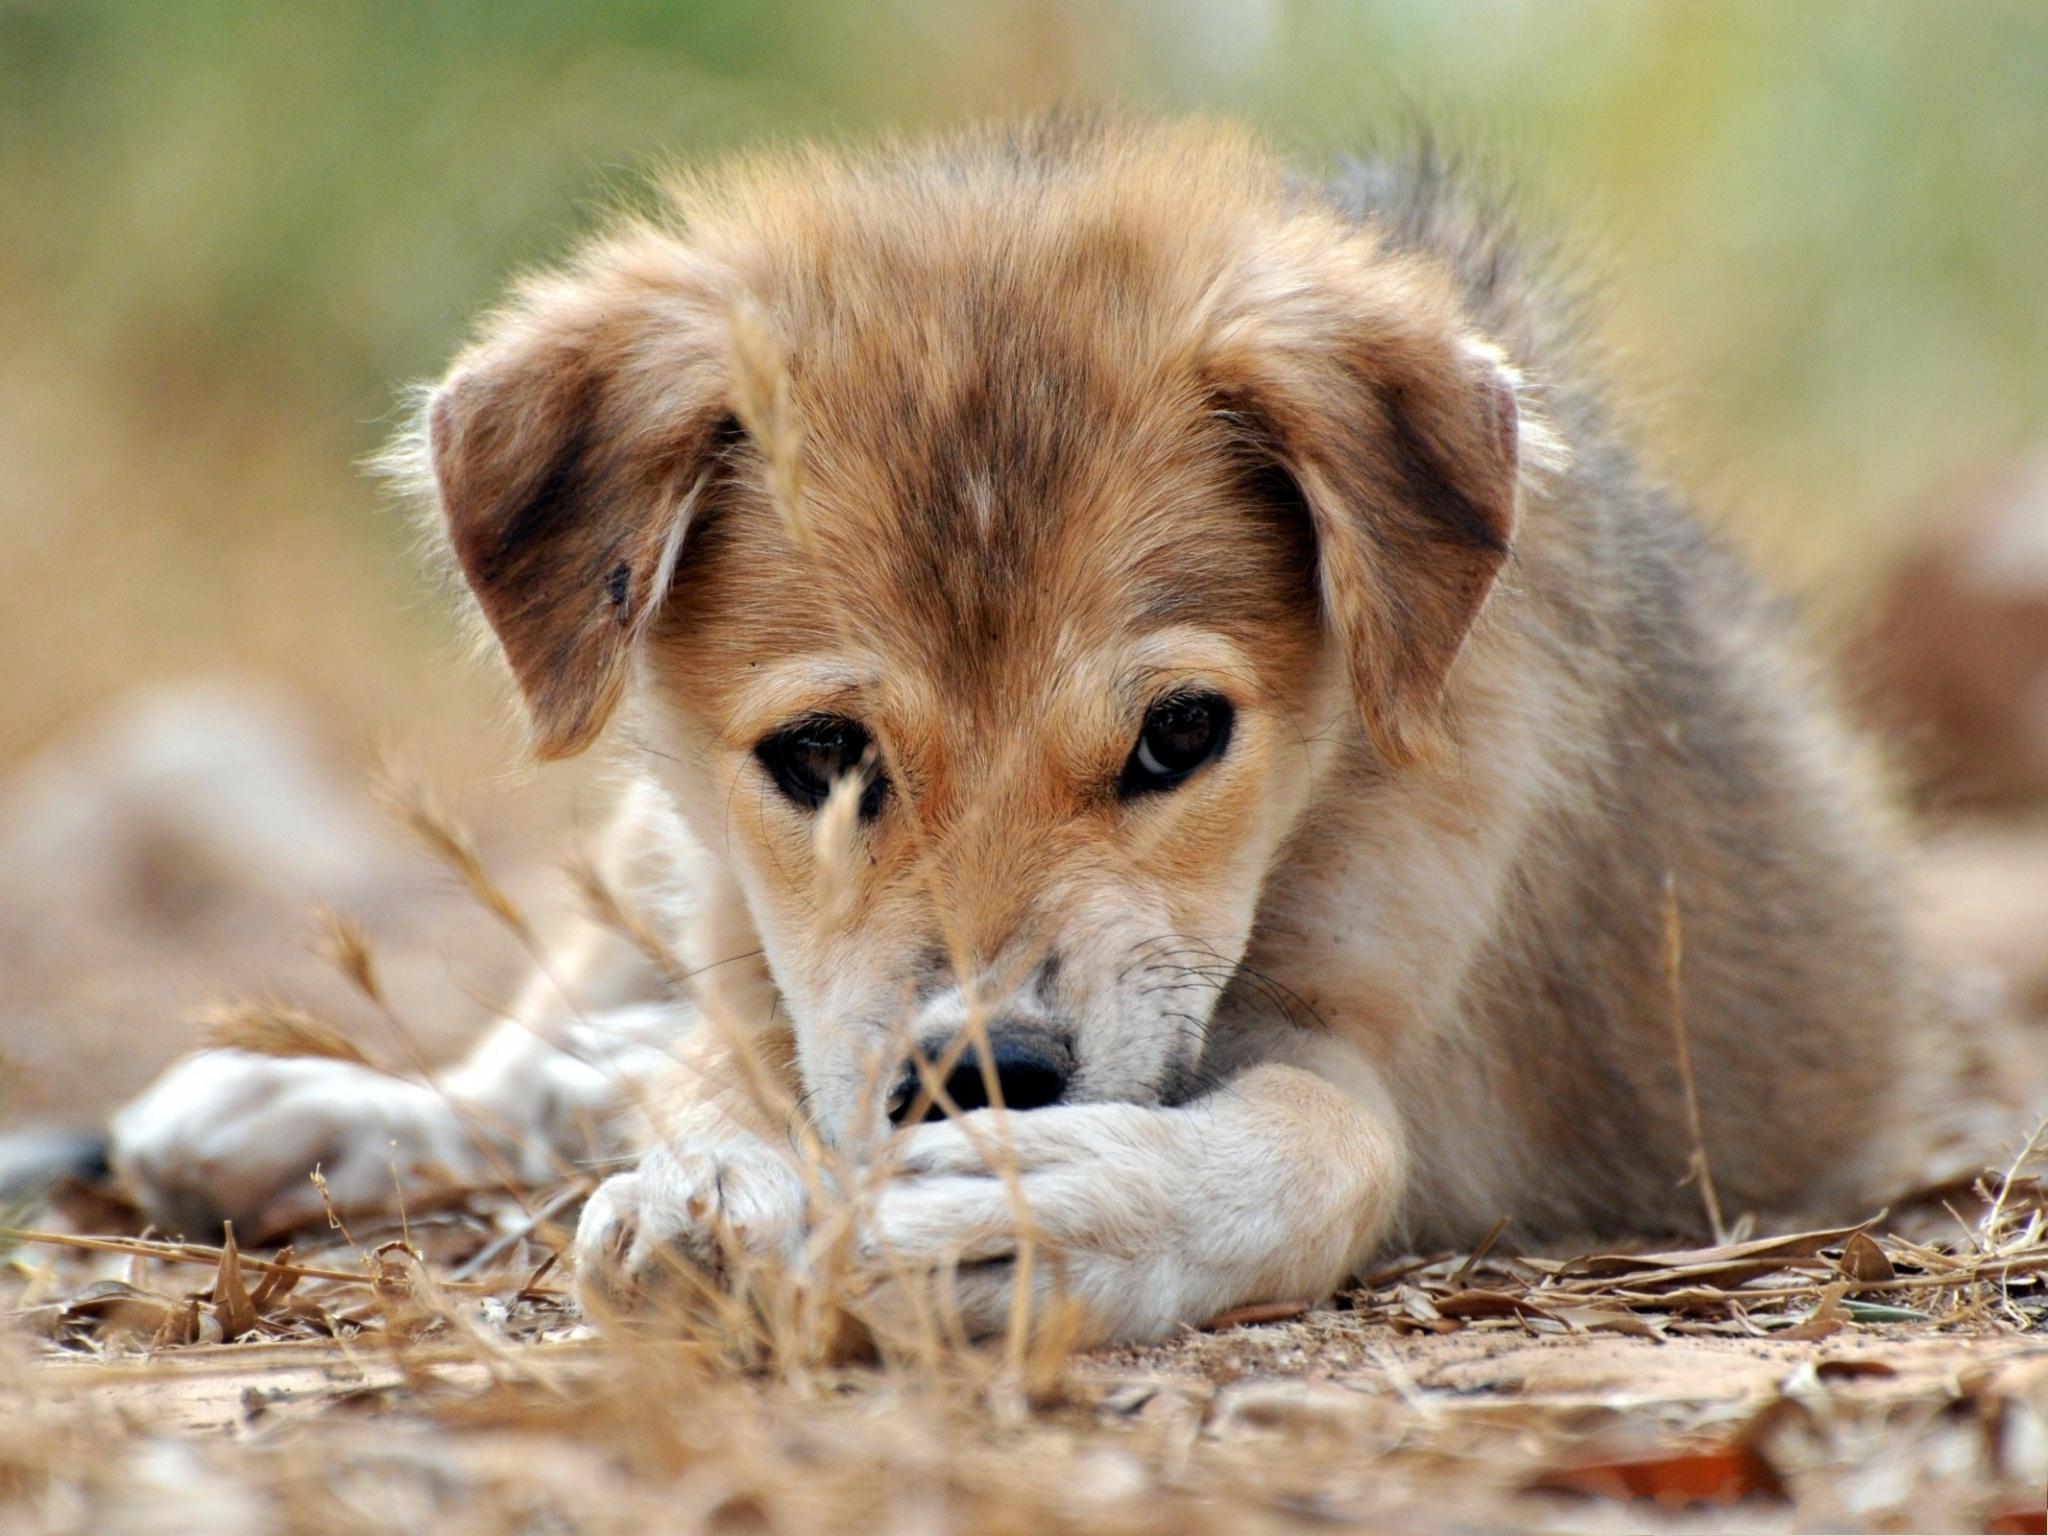 download wallpaper dog little - photo #40